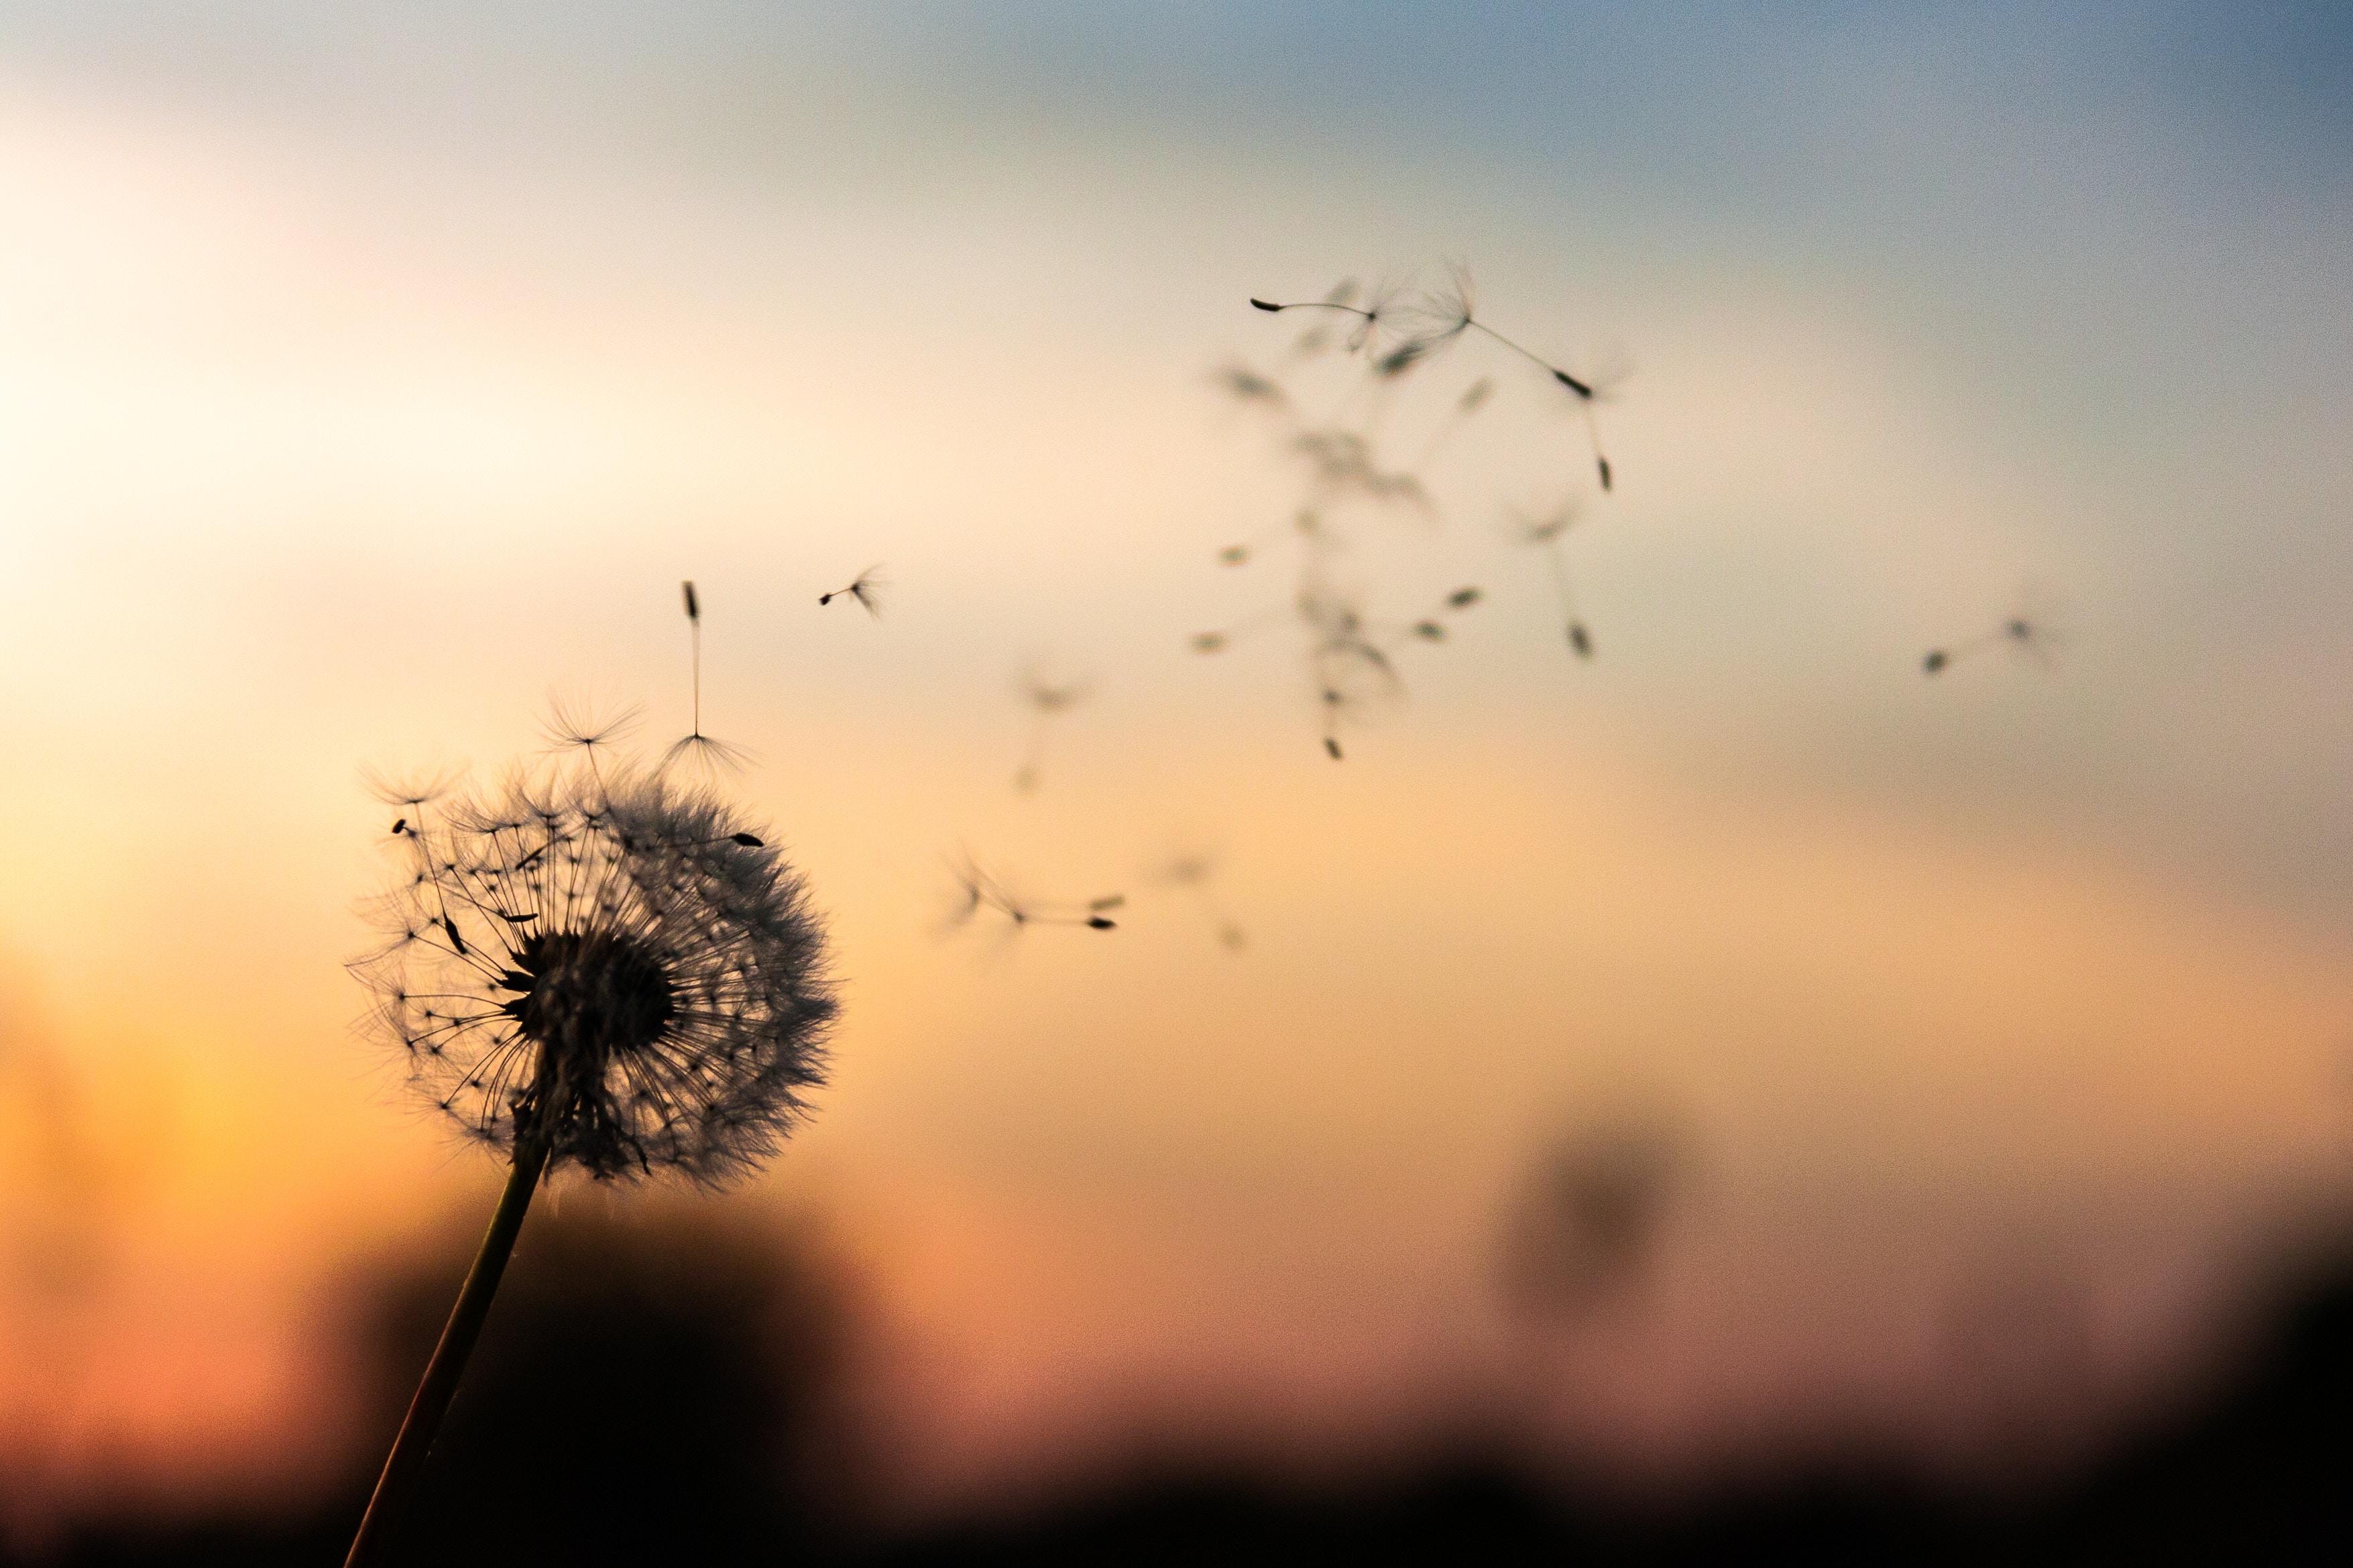 Dandelion flying